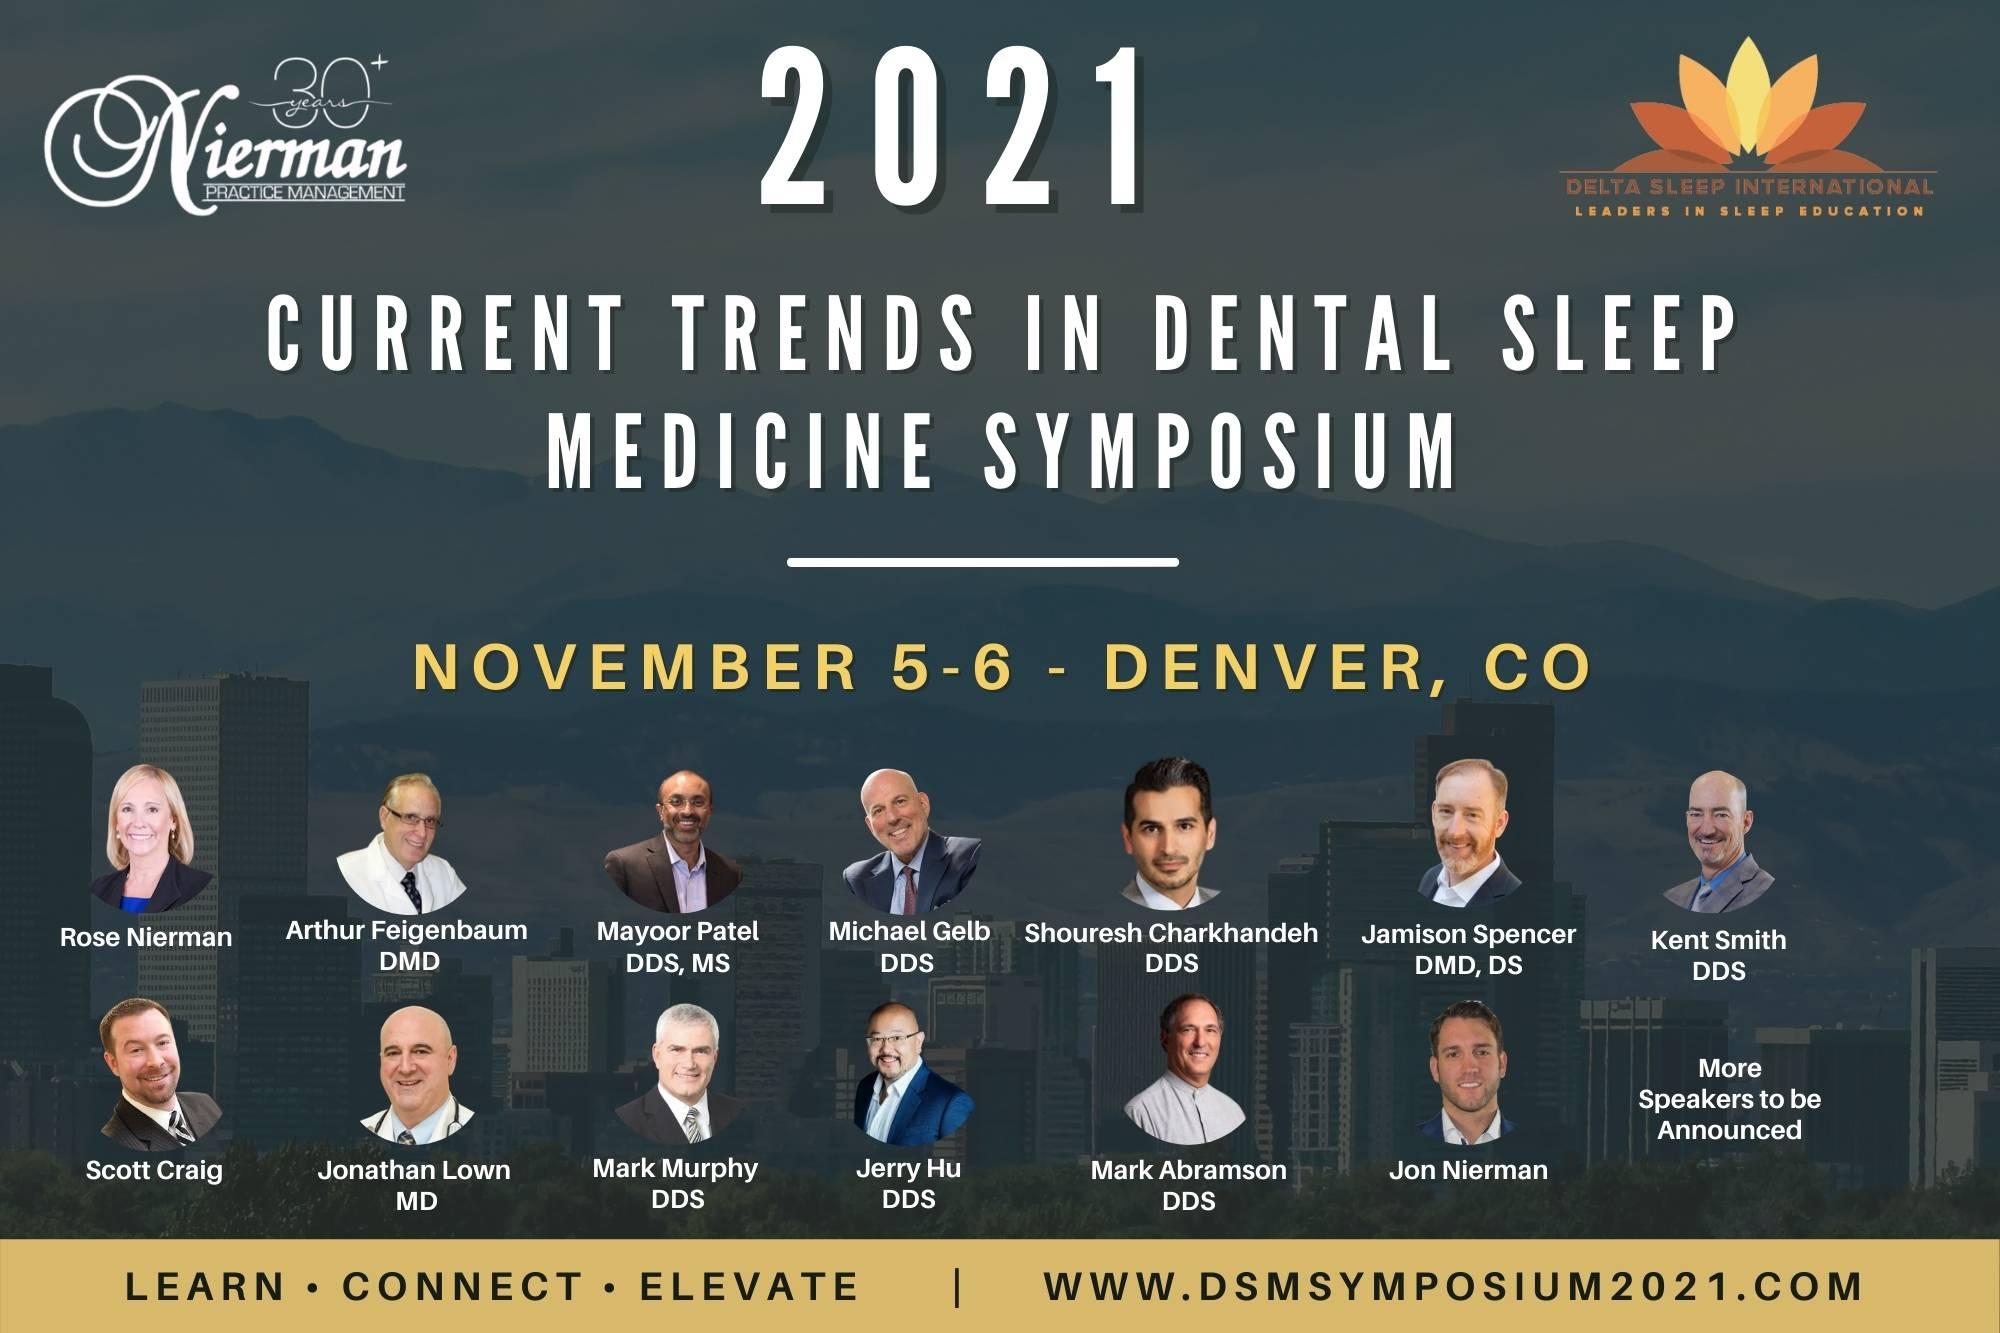 Current Trends in Dental Sleep Medicine Symposium